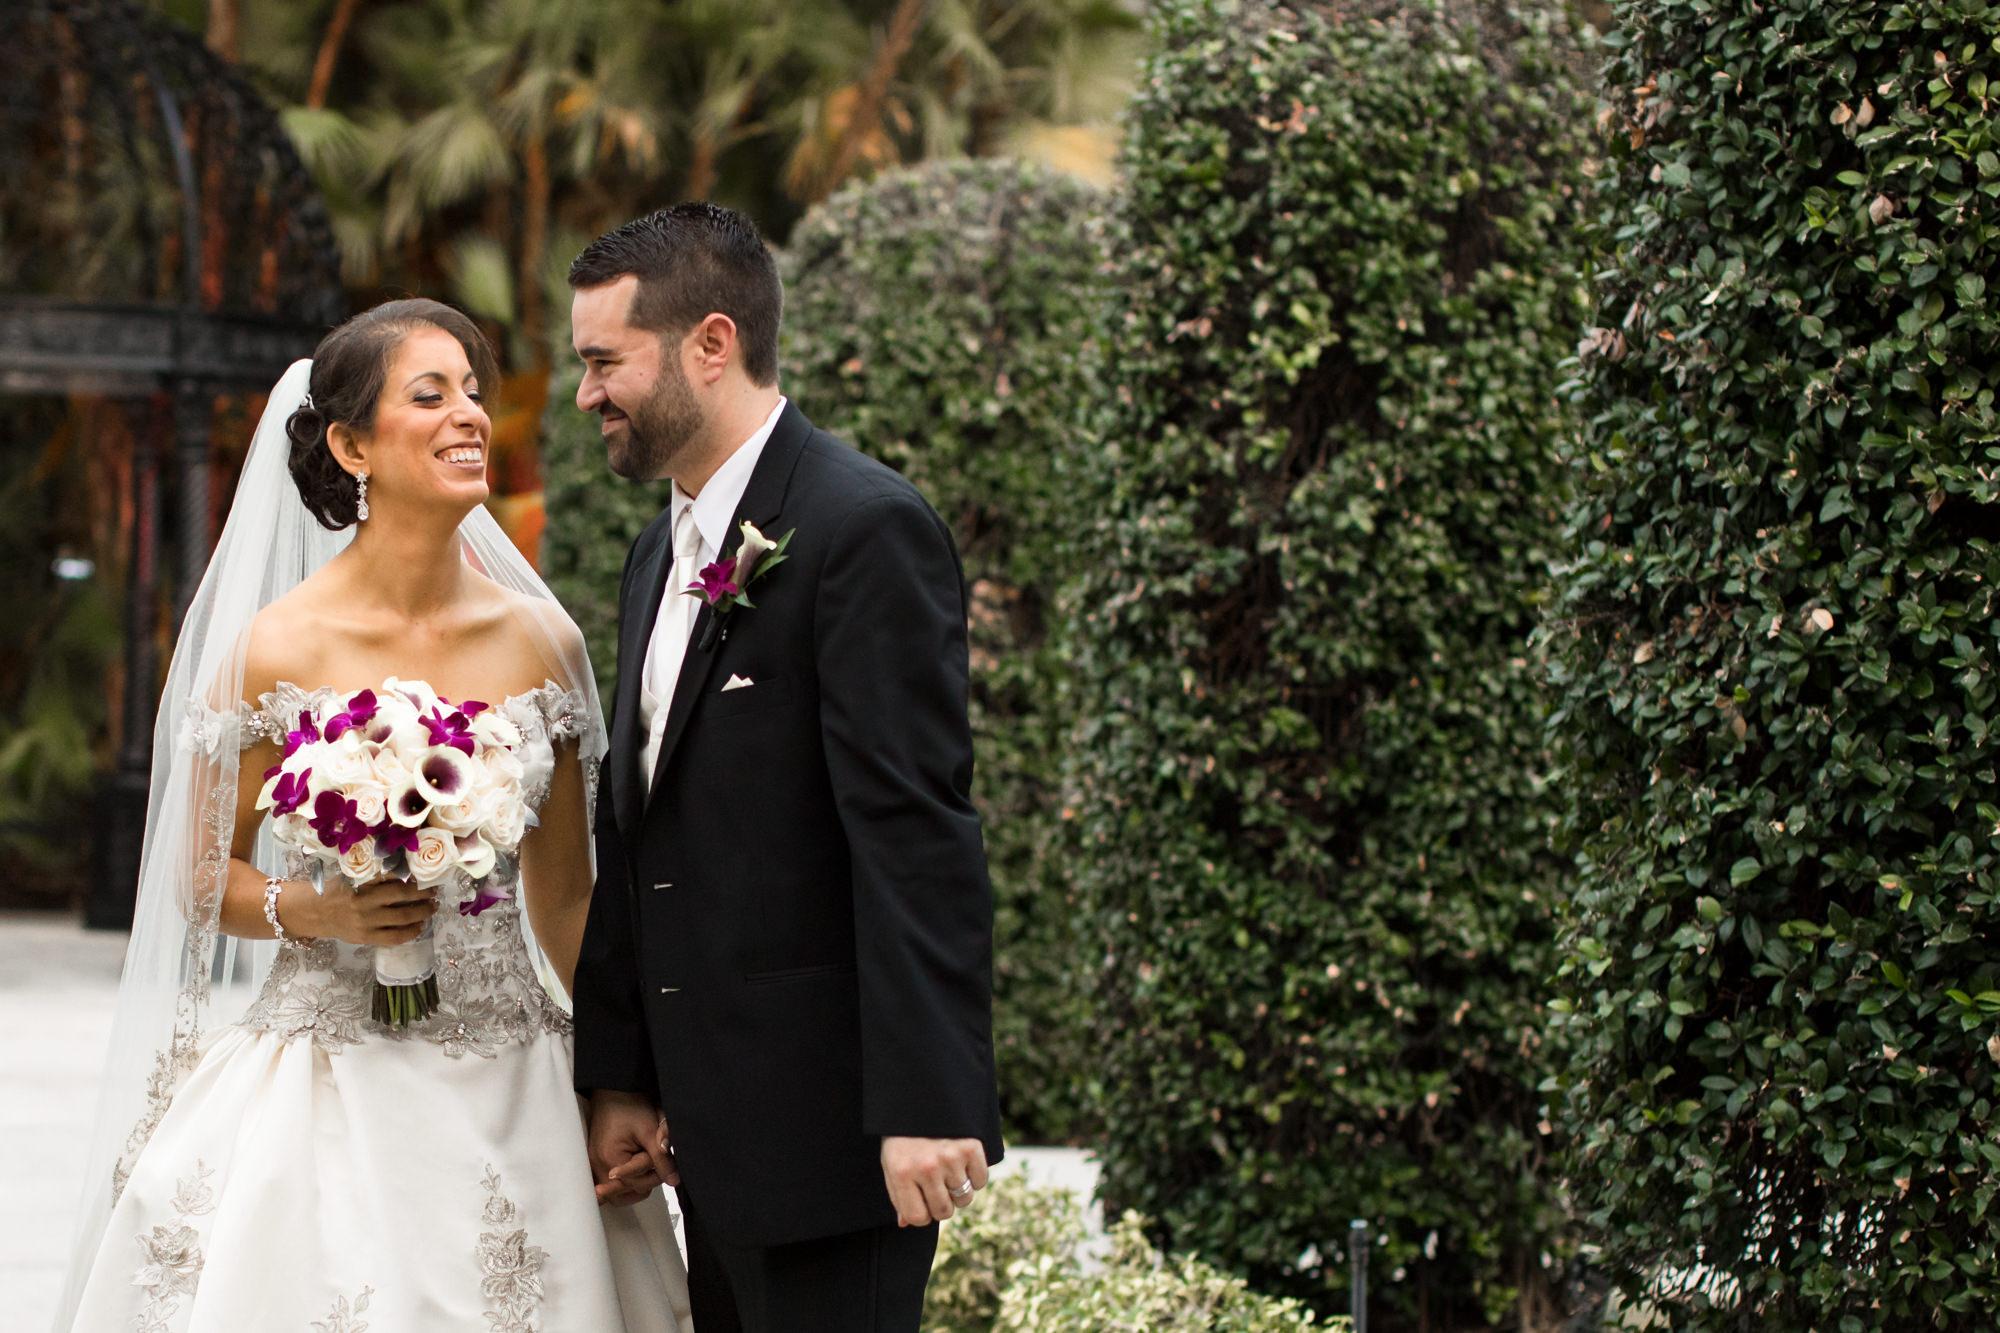 Benvenuto_Wedding_catholic_Florida_Bride-Groom-74.jpg